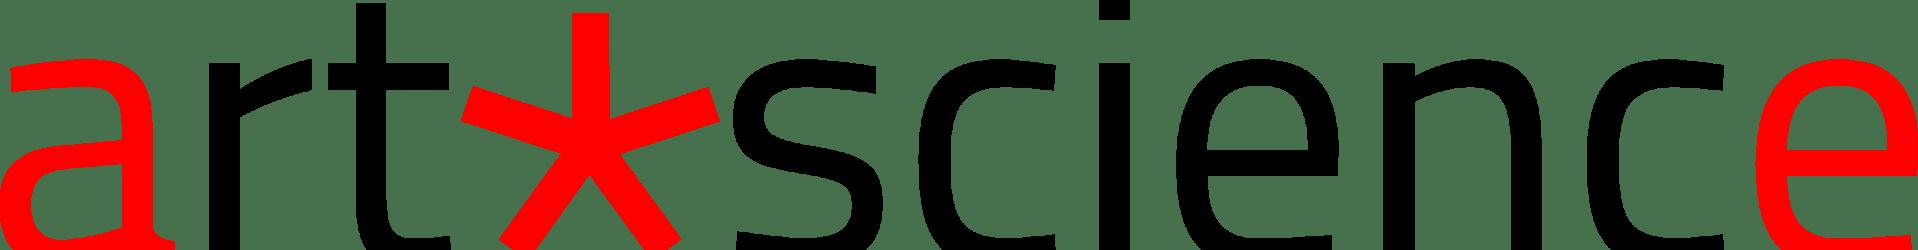 n-blog is a partner of art*science 2017/Leonardo 50